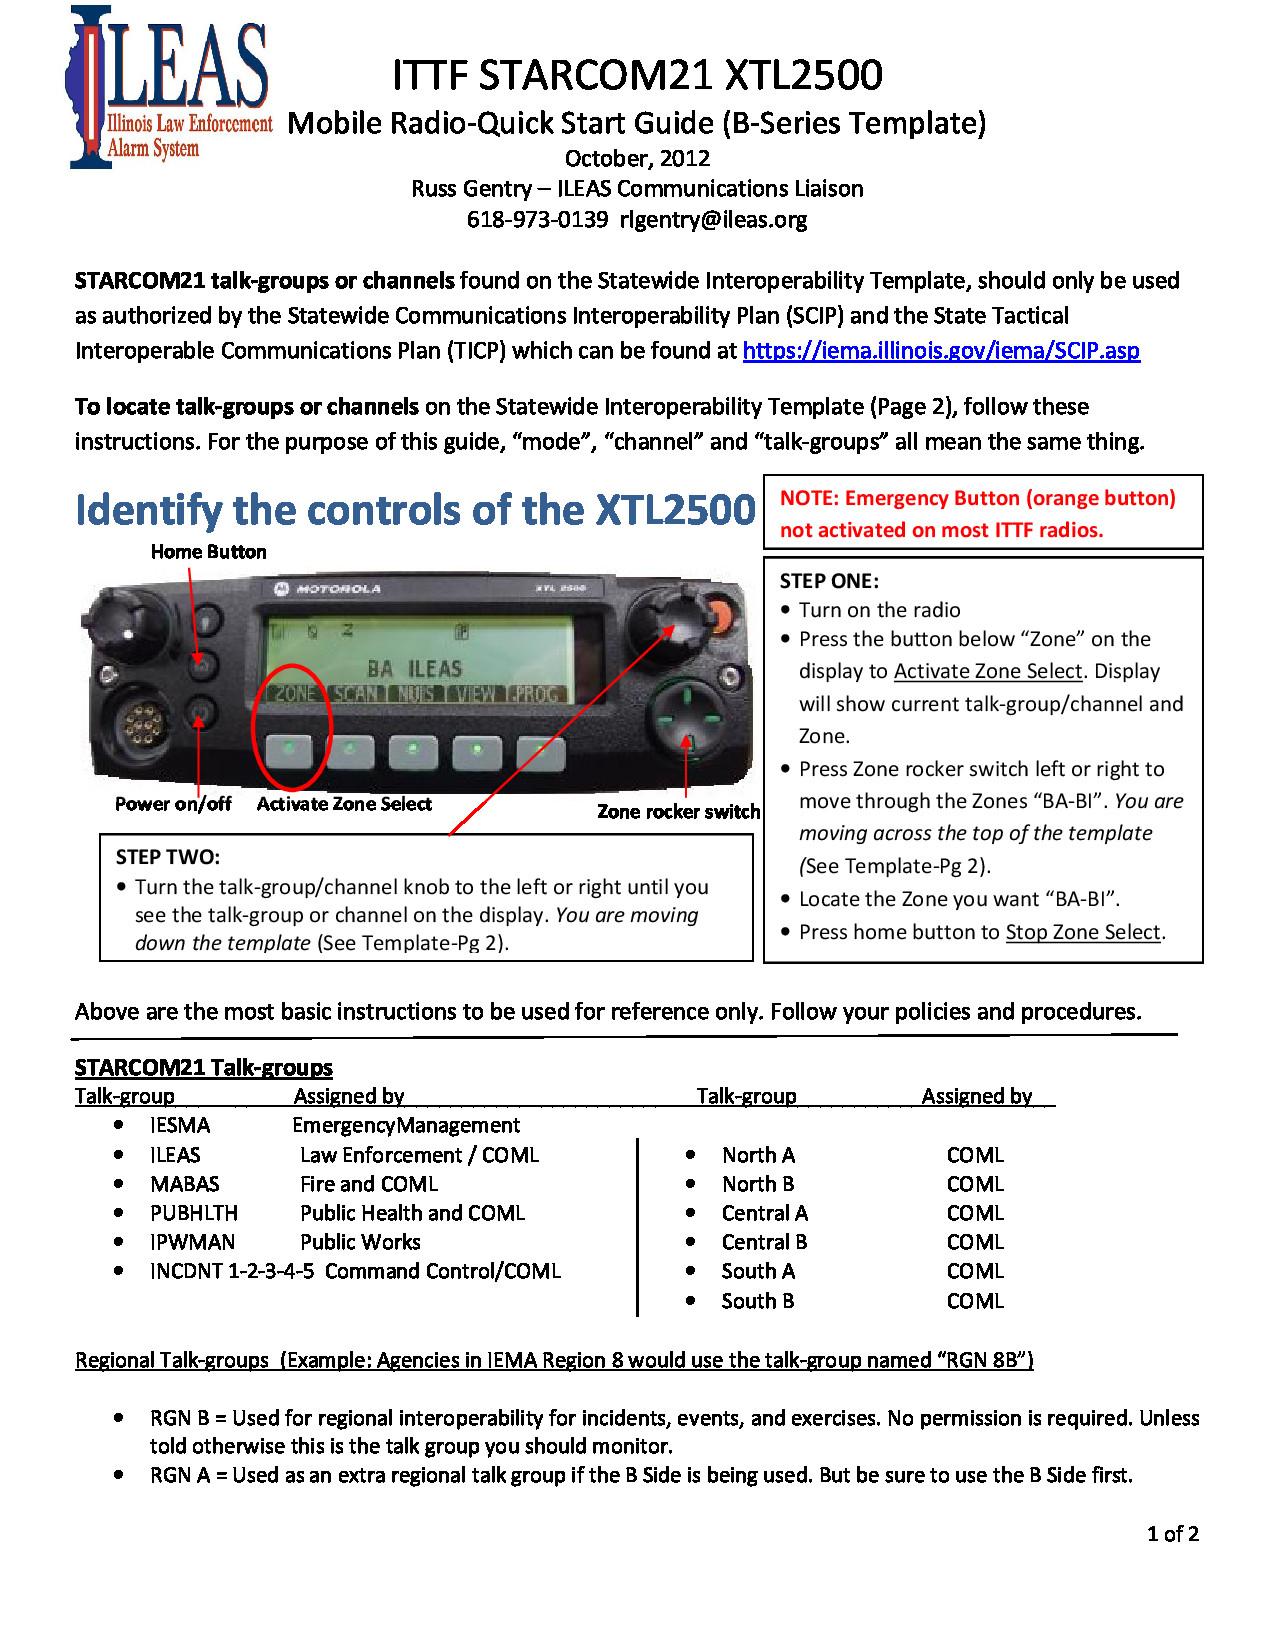 XTL2500 Guide 1